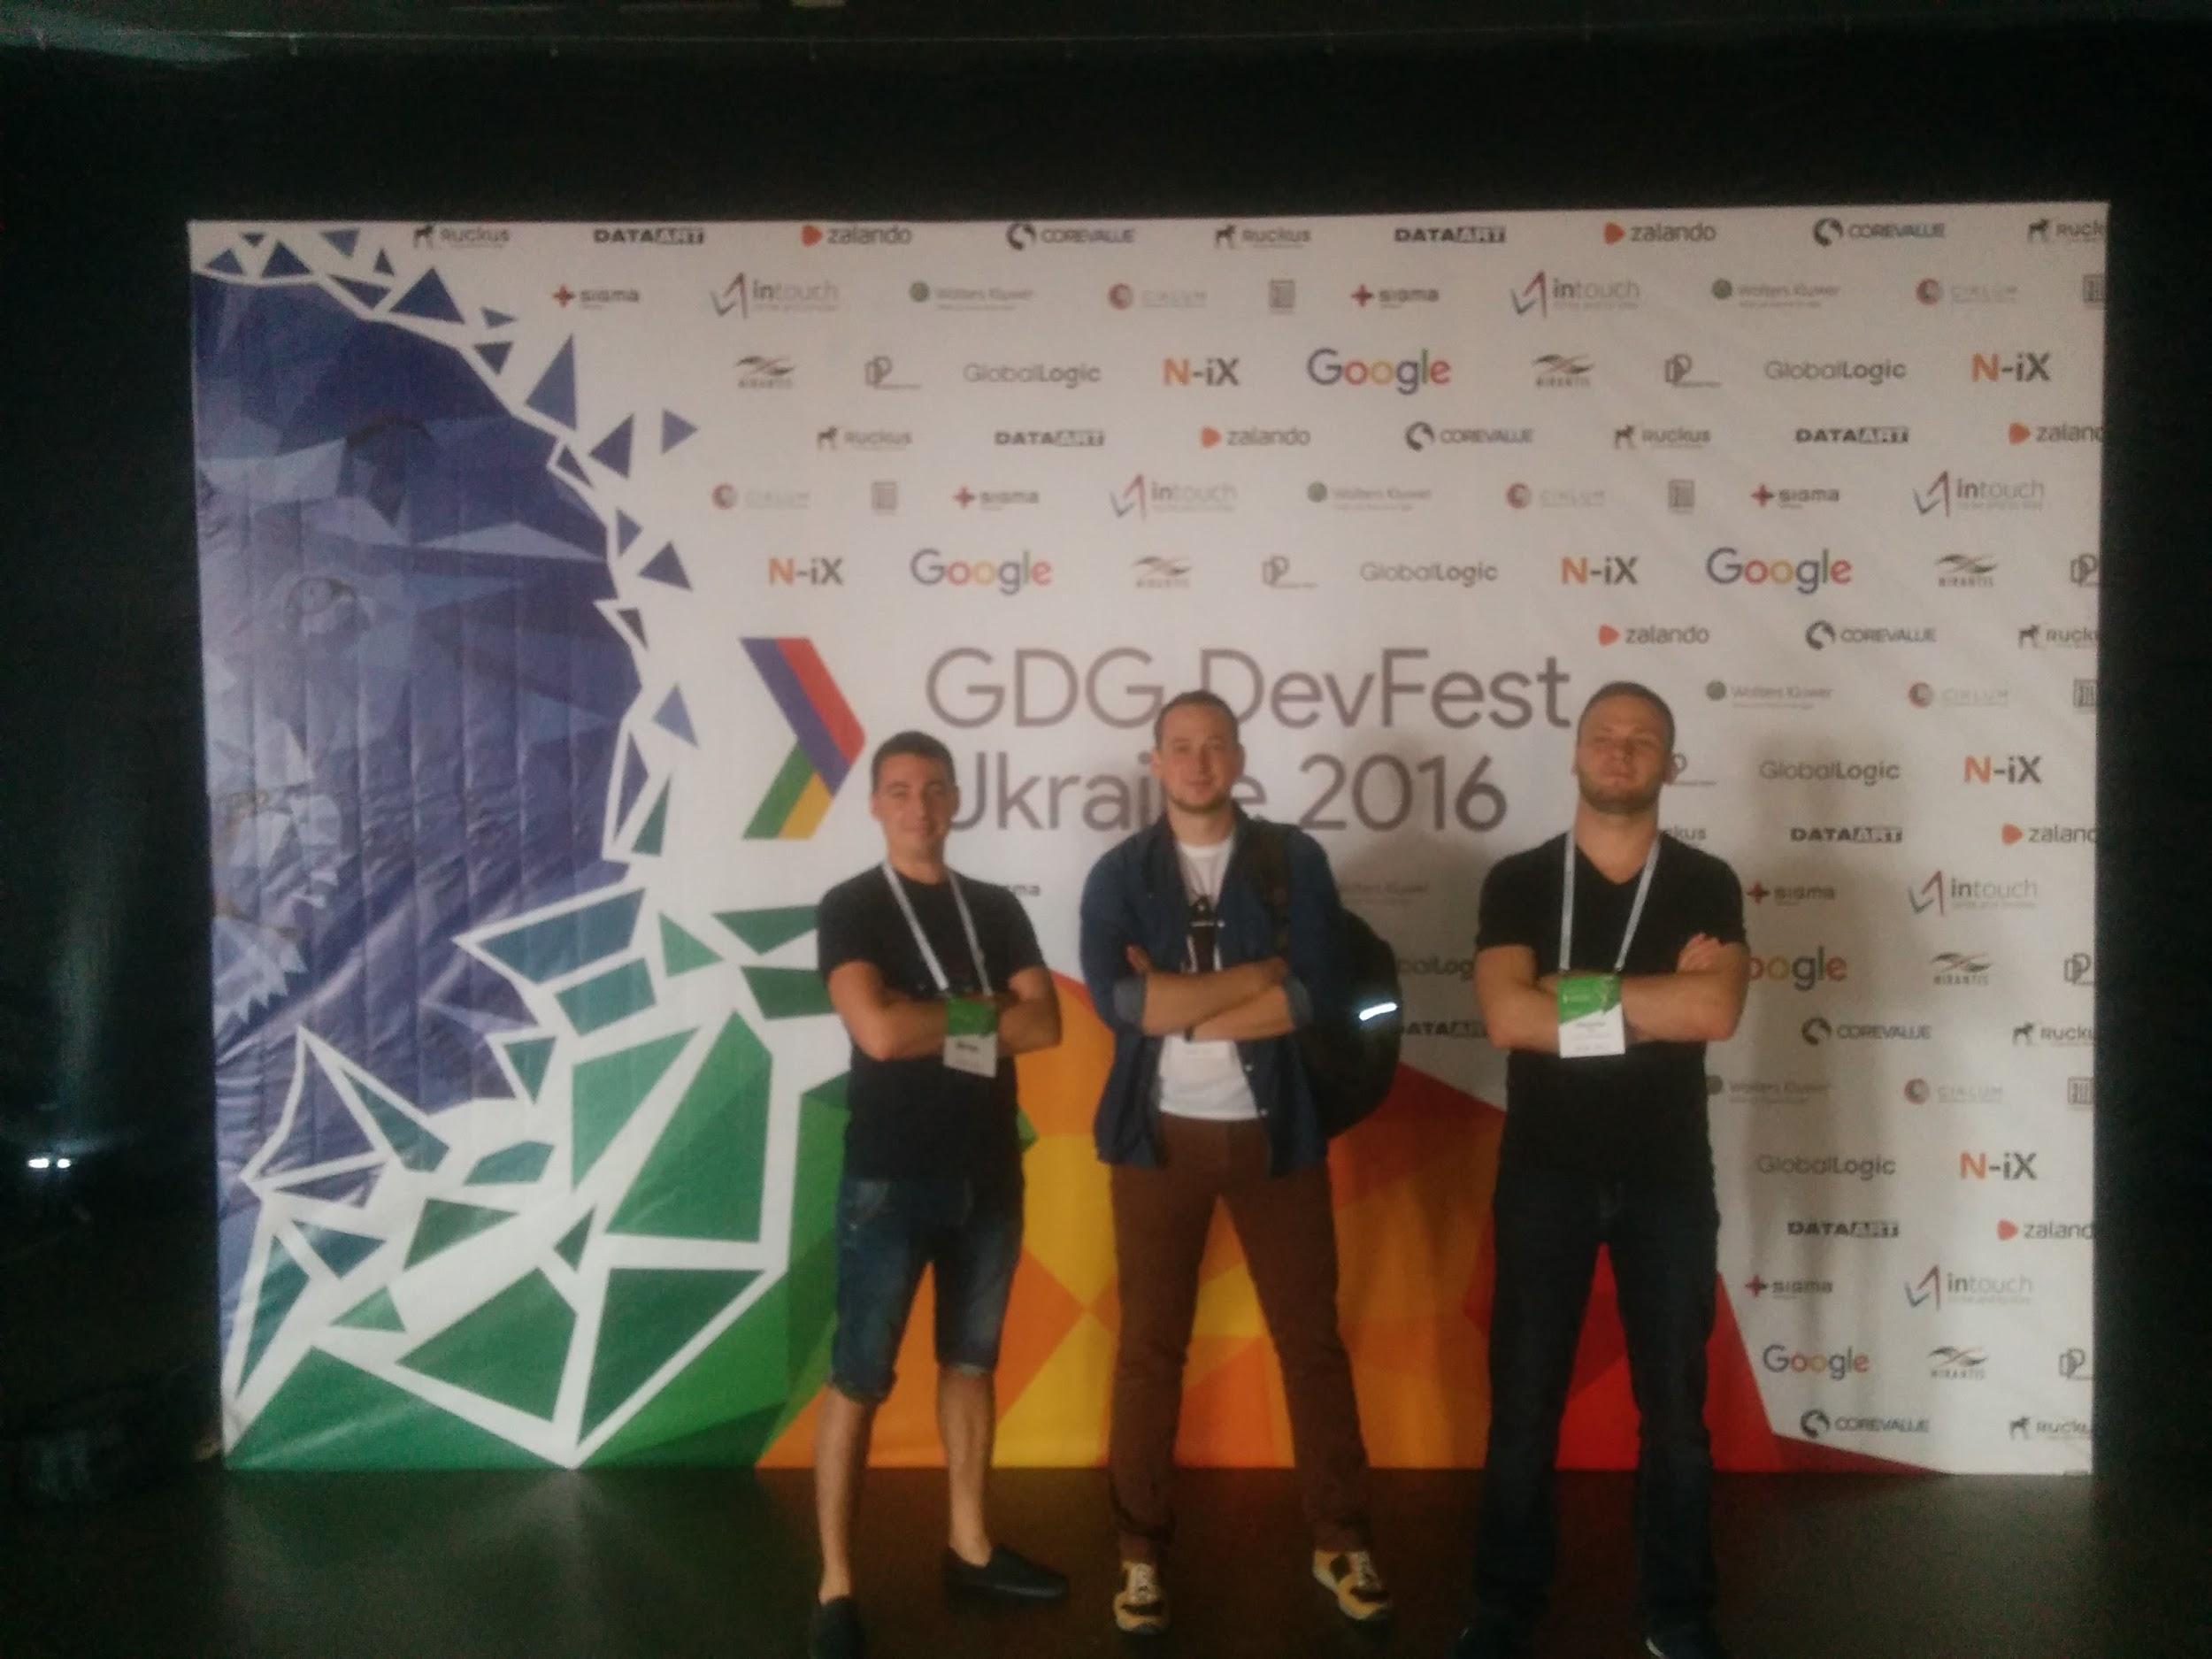 Команда stfalcon.com GDG DevFest 2016